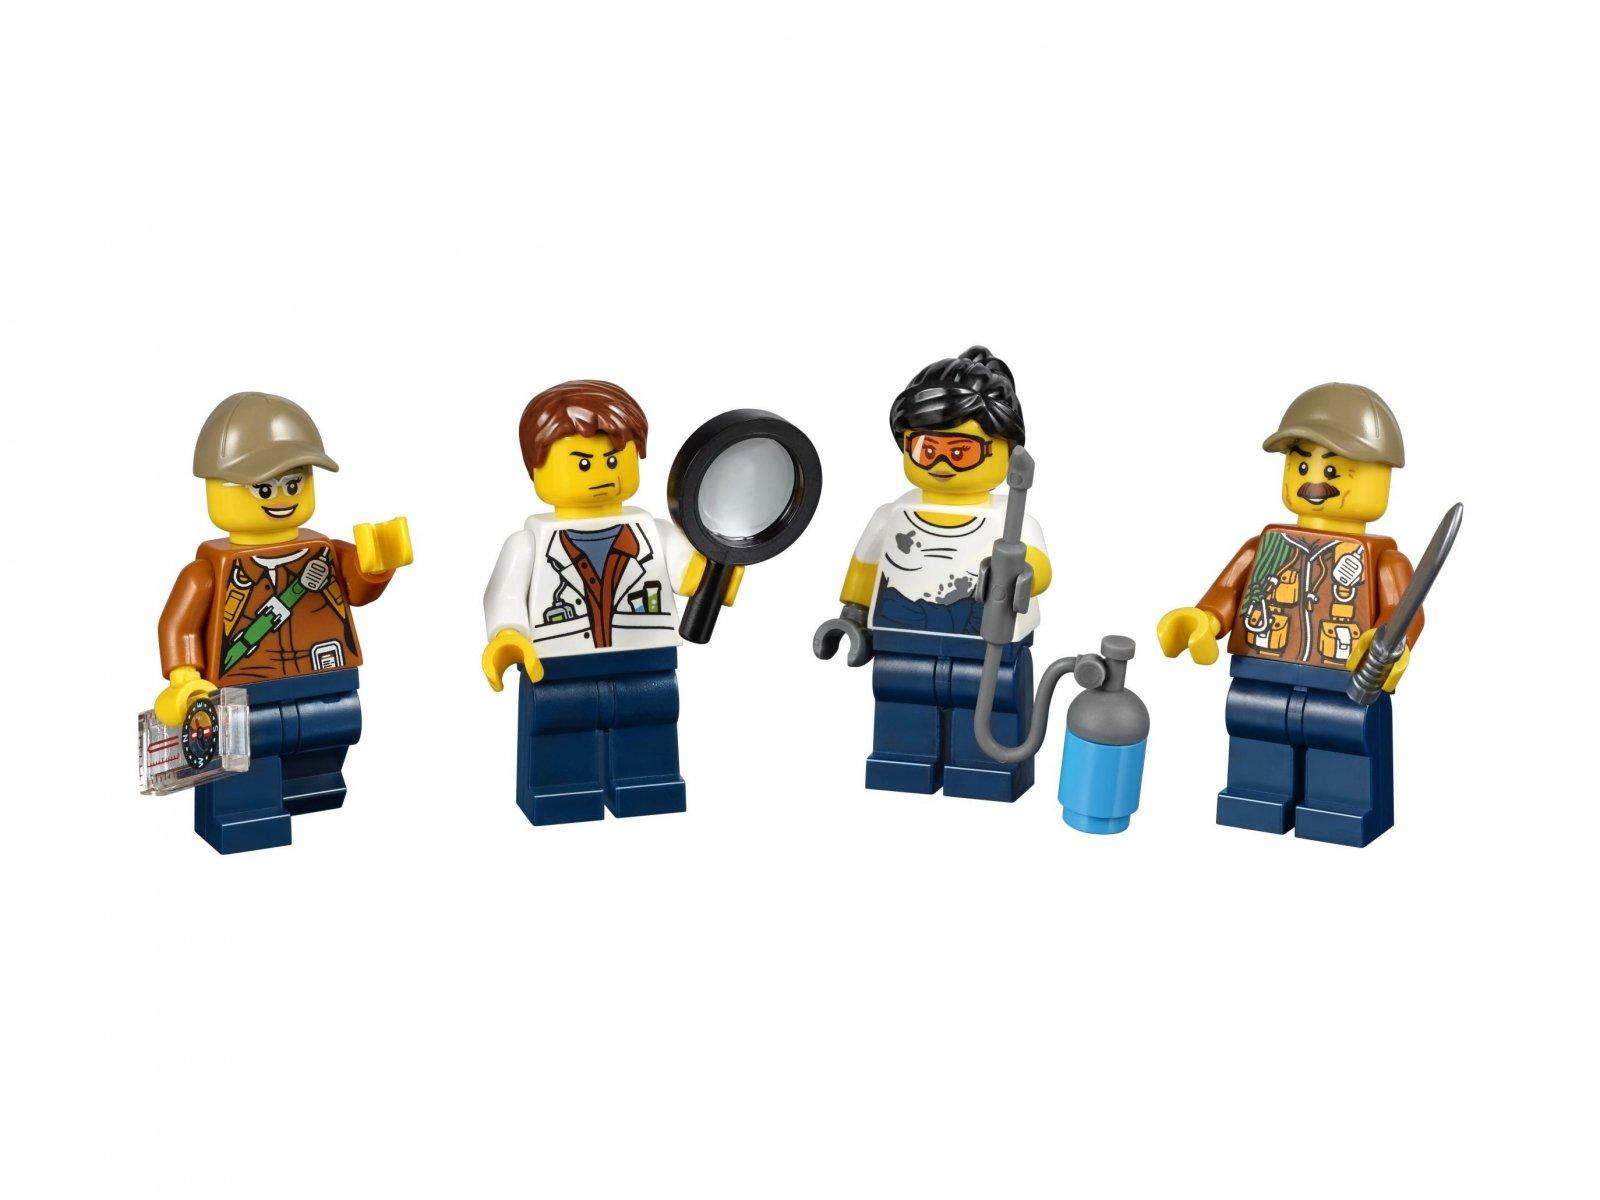 LEGO 5004940 Bricktober - zestaw minifigurek